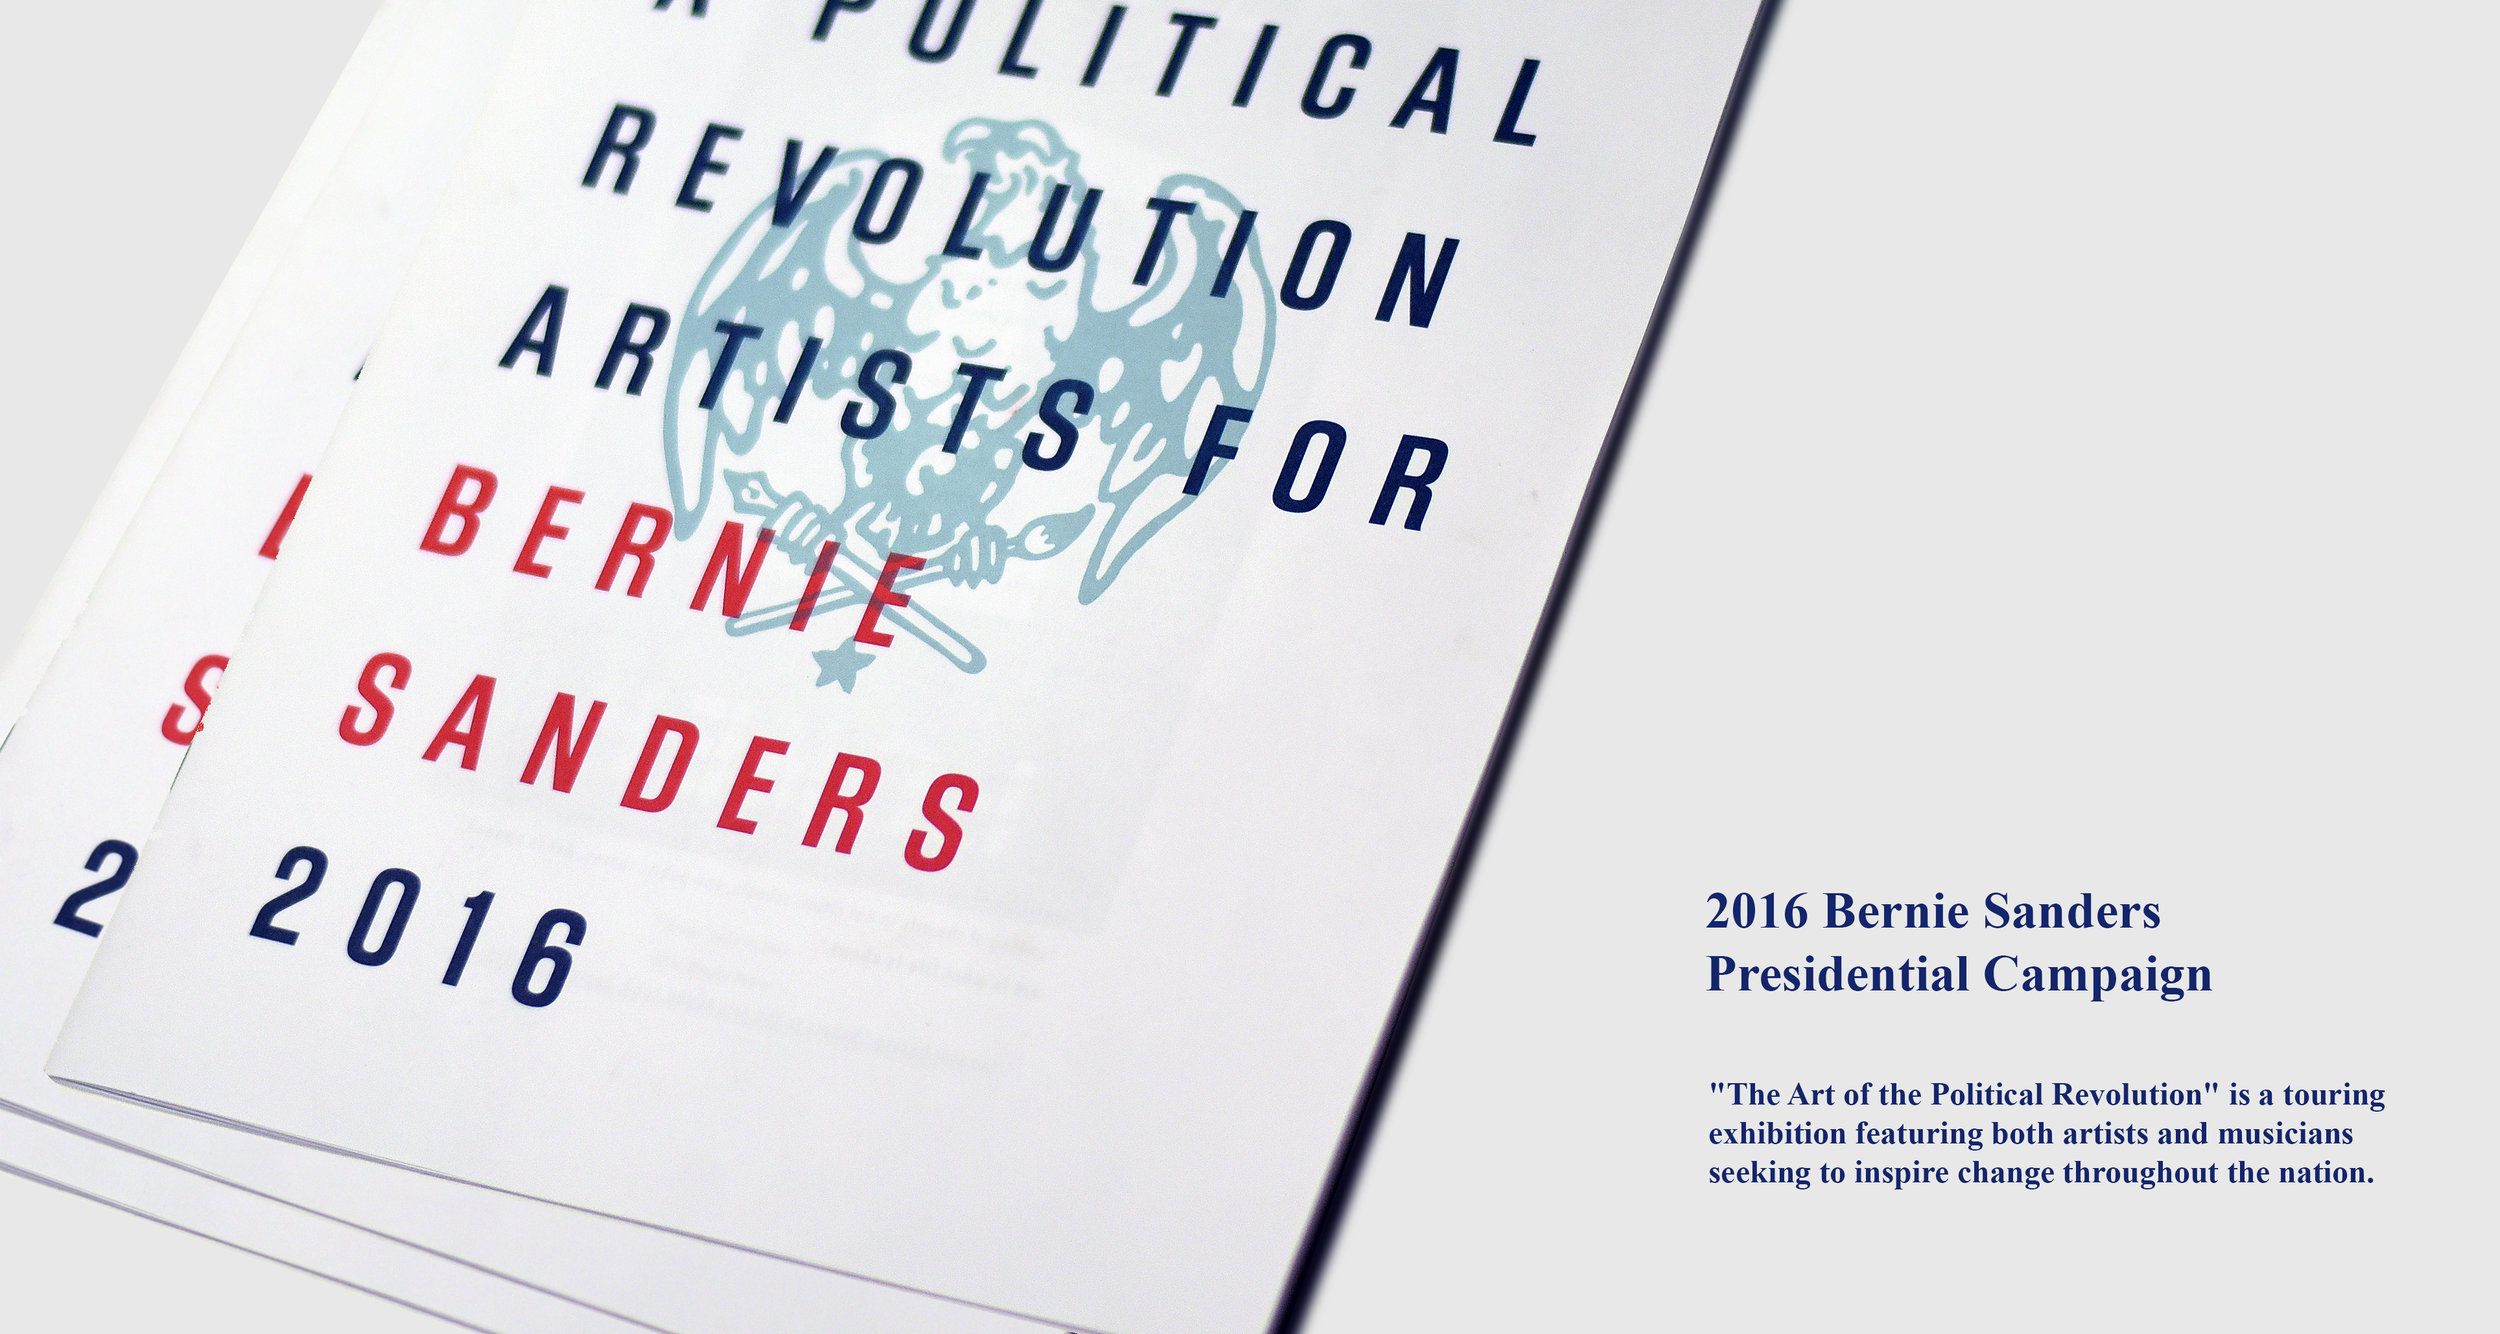 2016 BERNIE SANDERS PRESIDENTIAL CAMPAIGN